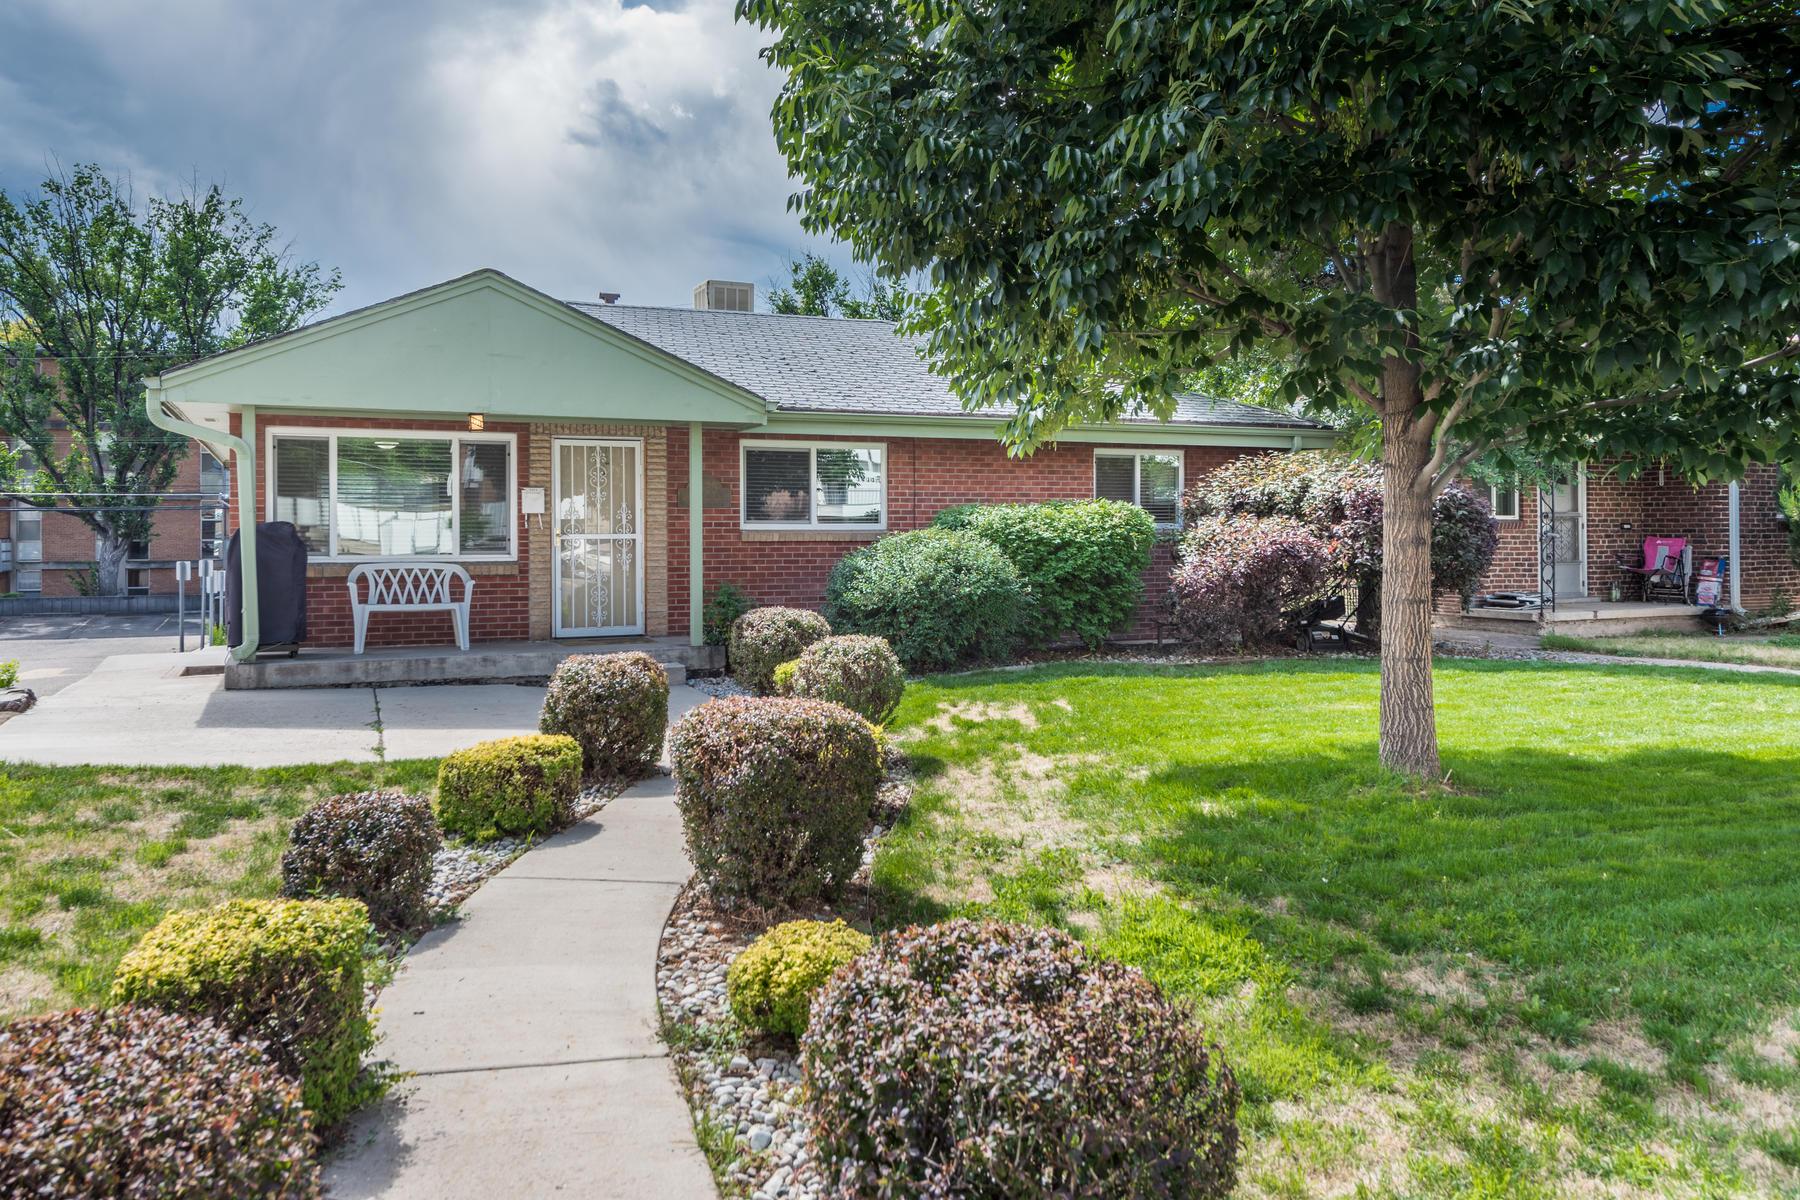 Duplex for Active at Income Property close to University of Denver 2525-2527 S University Blvd Denver, Colorado 80210 United States